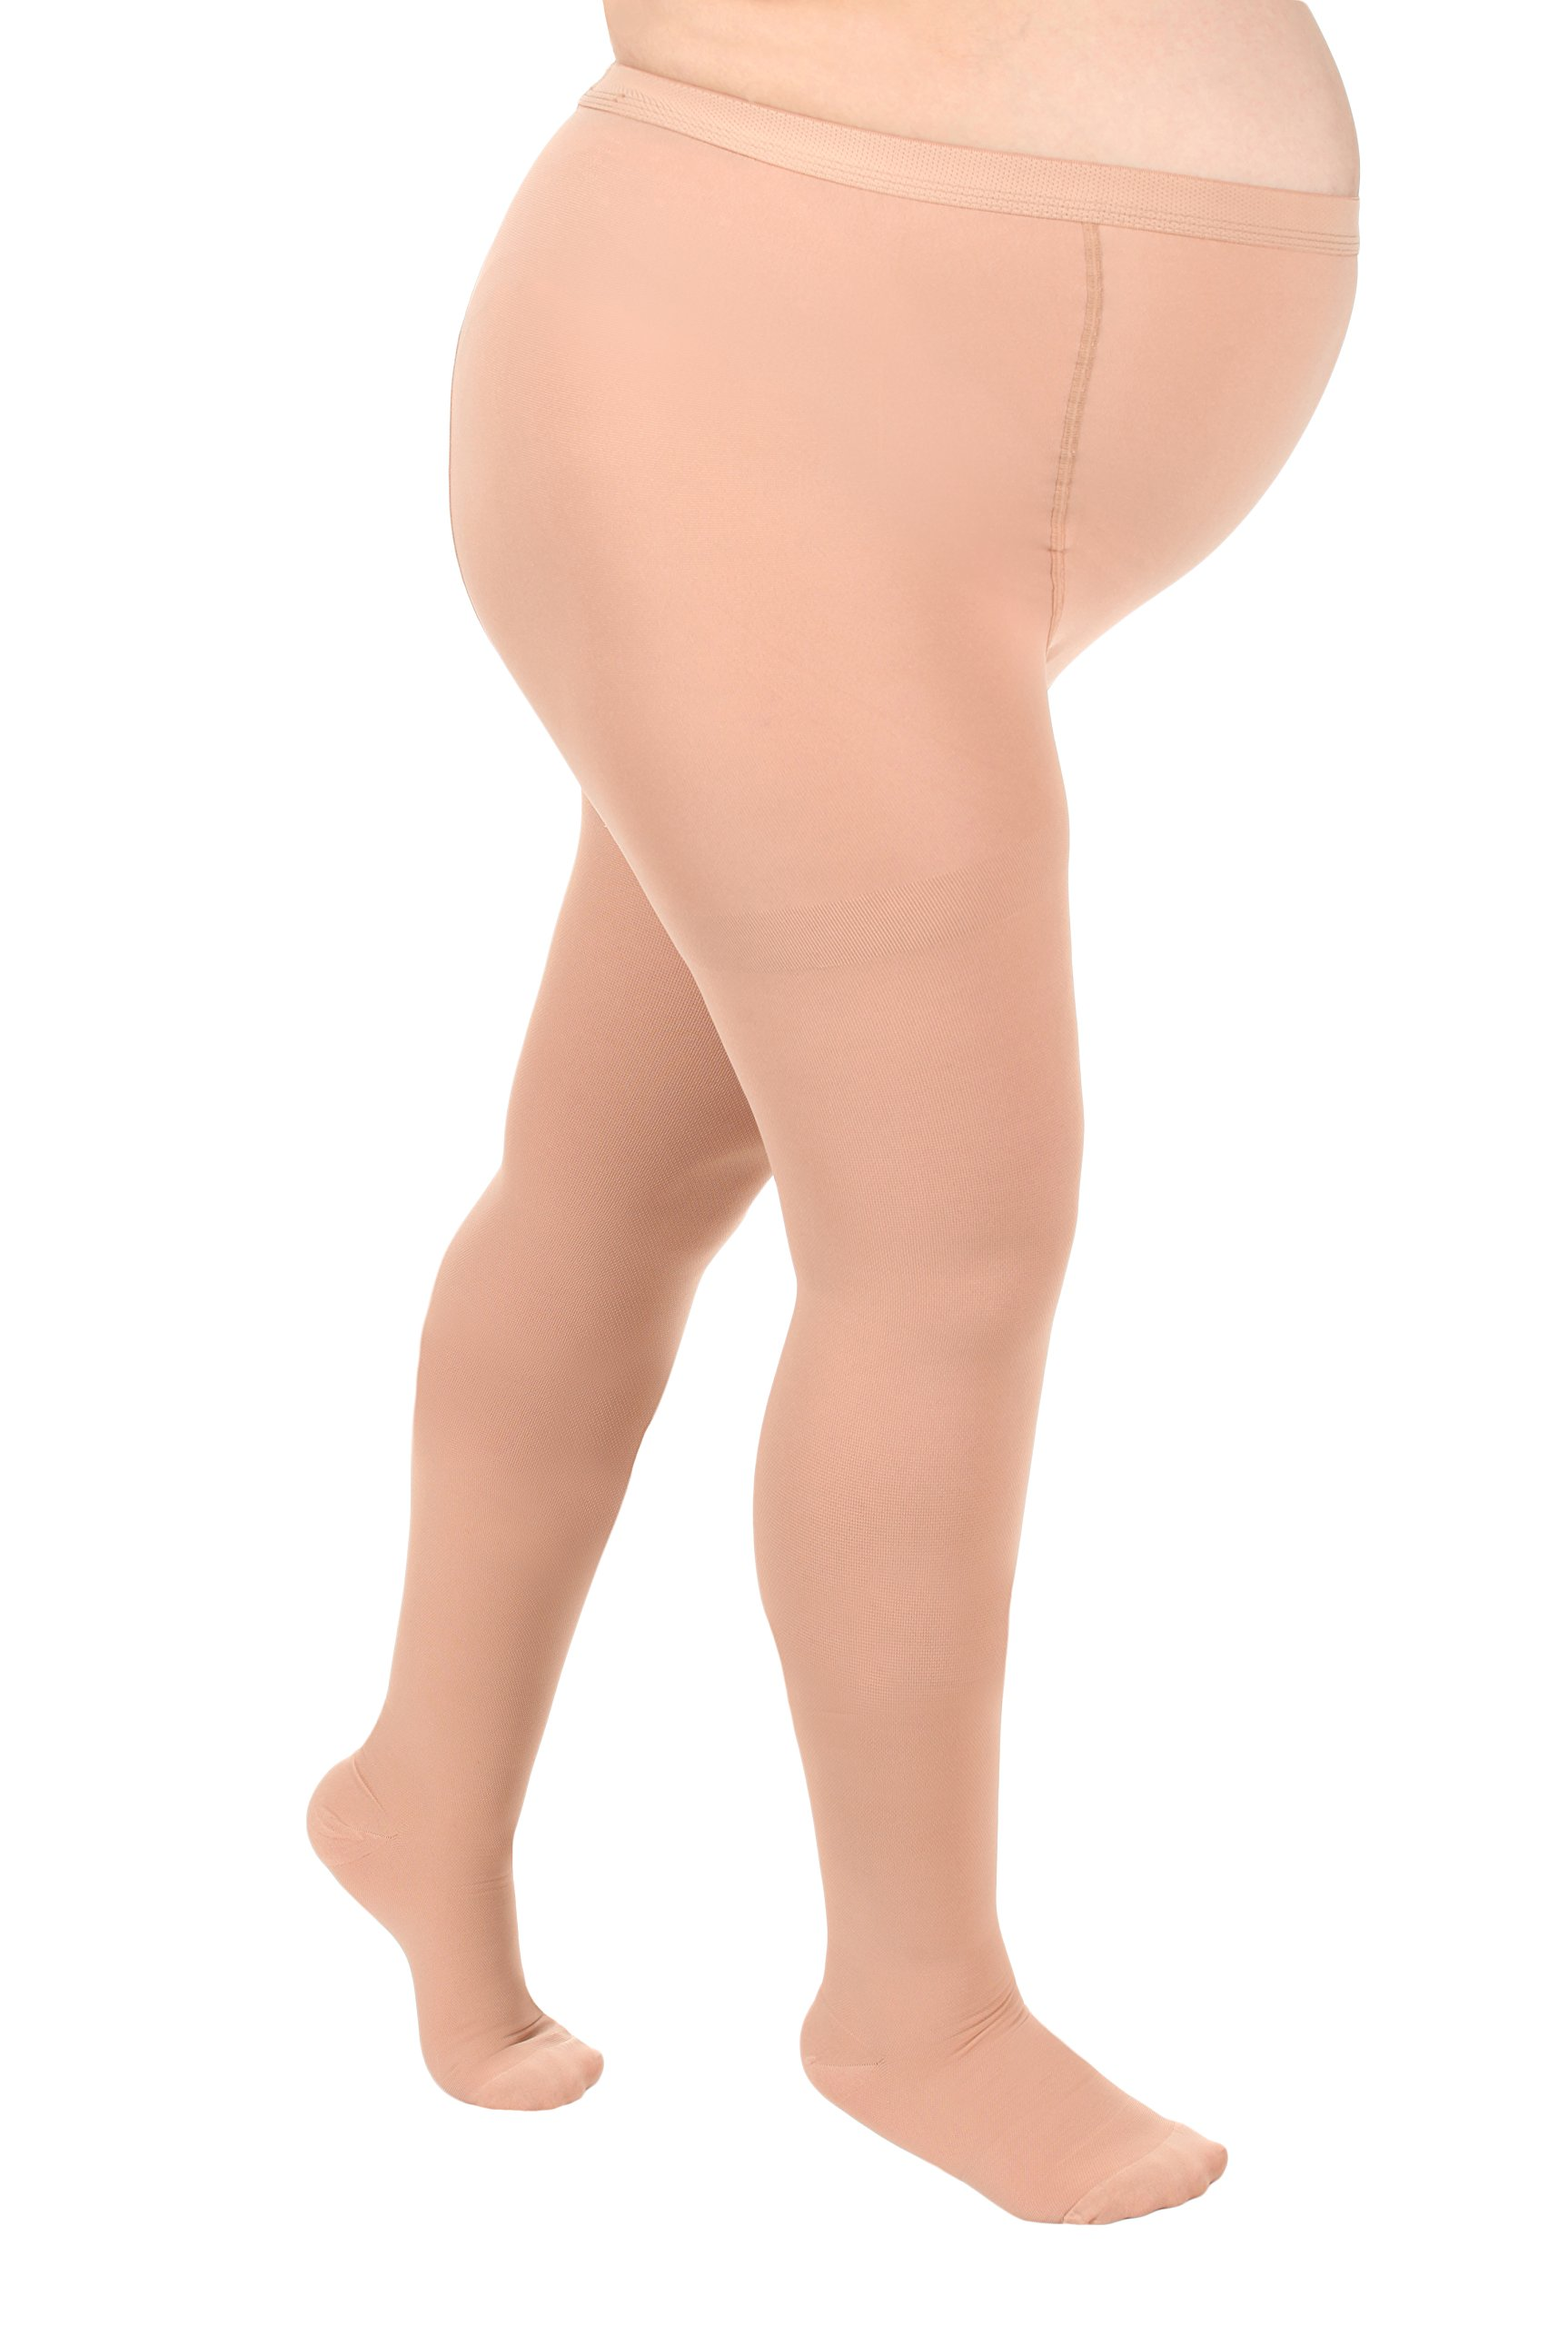 Upset over pantyhose